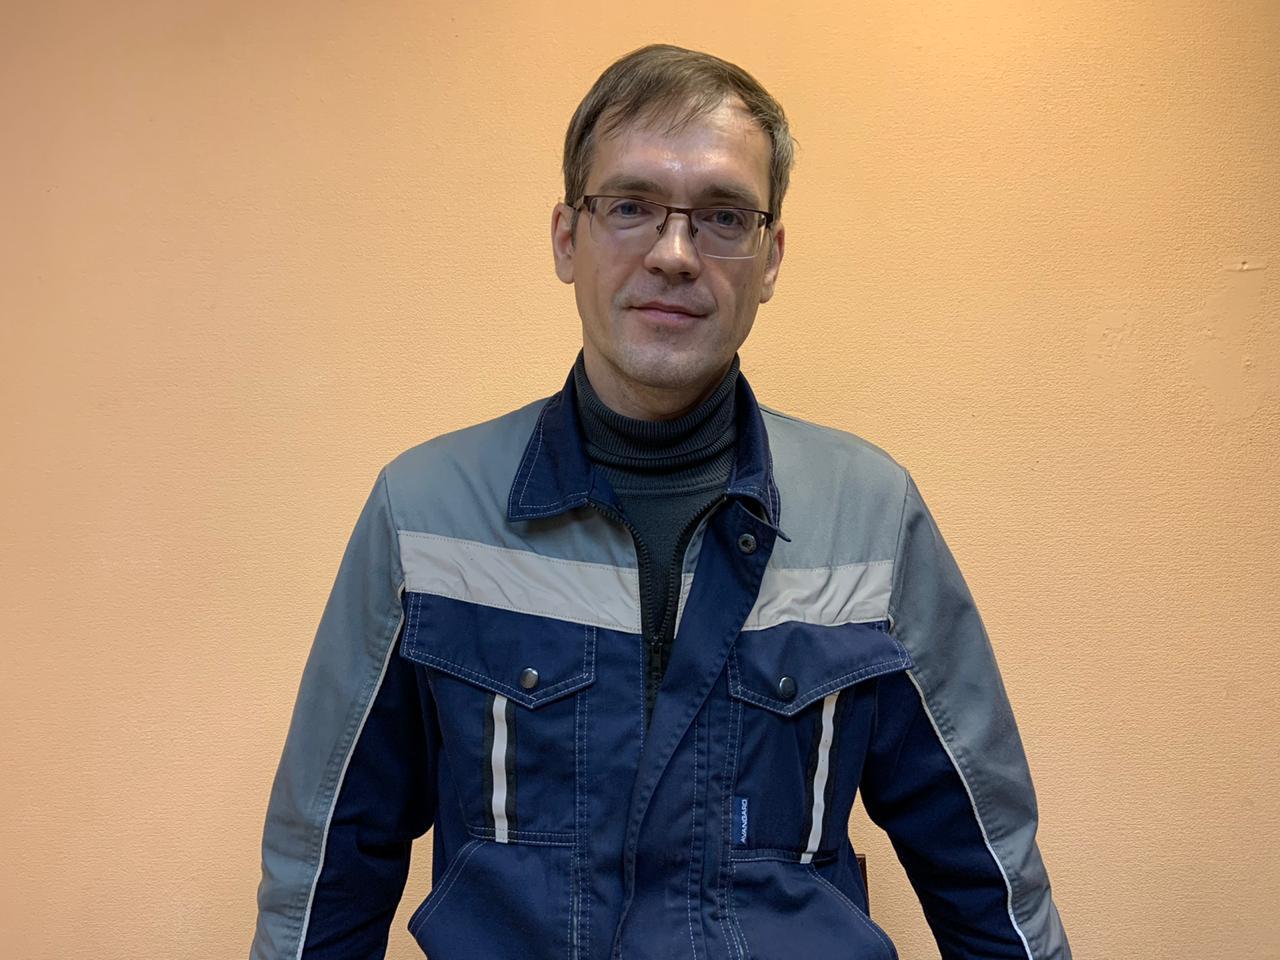 Дюпин Юрий Сергеевич